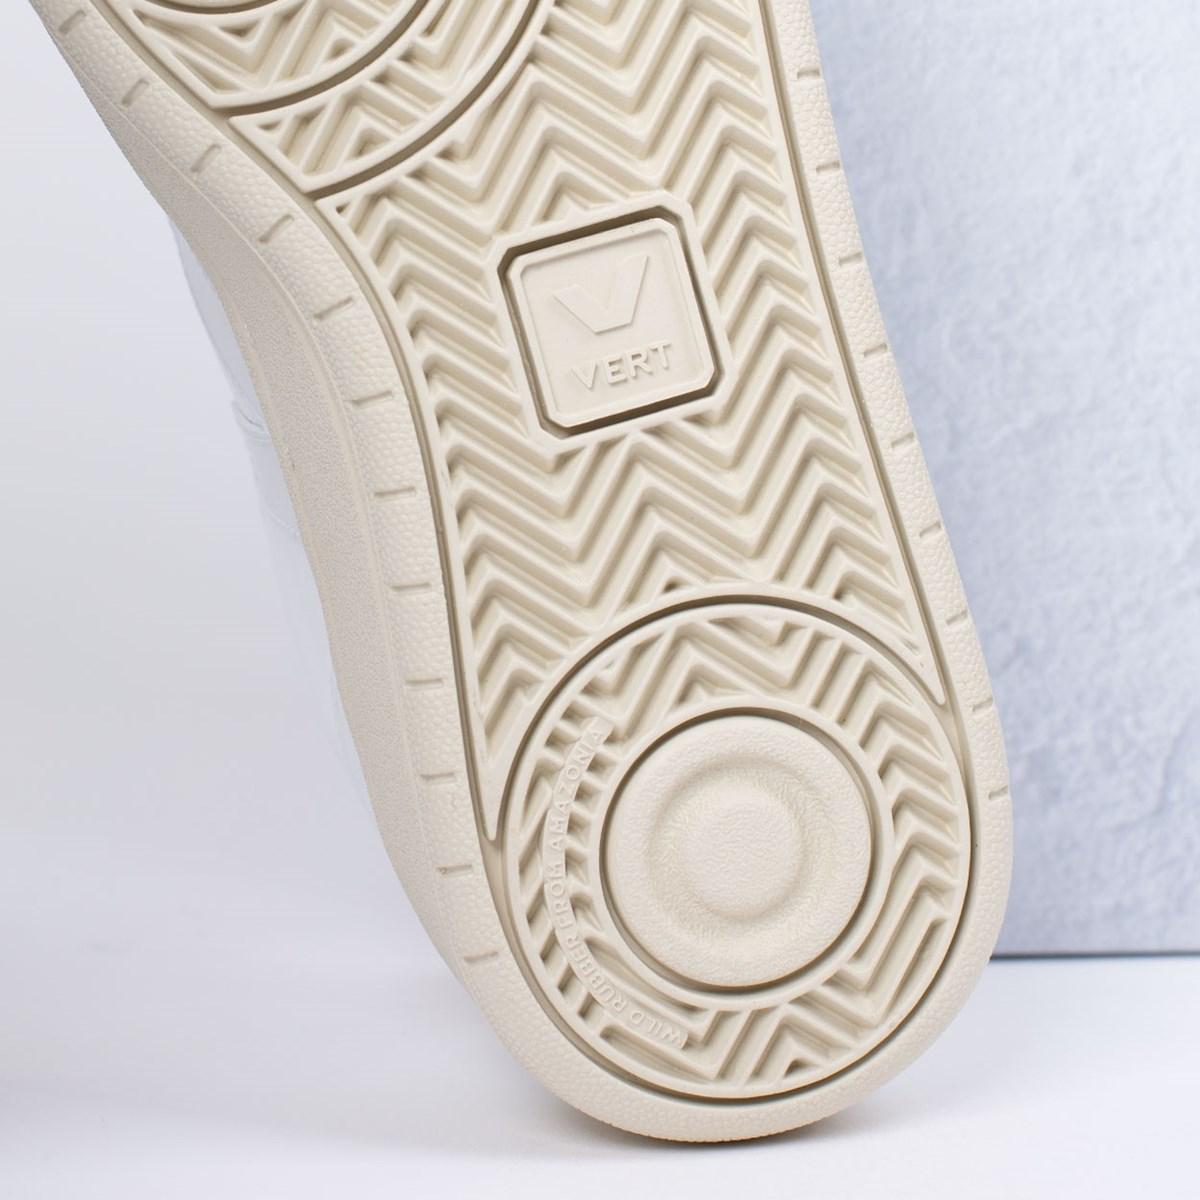 Tênis Vert Shoes V-10 CWL White White Natural VX072071